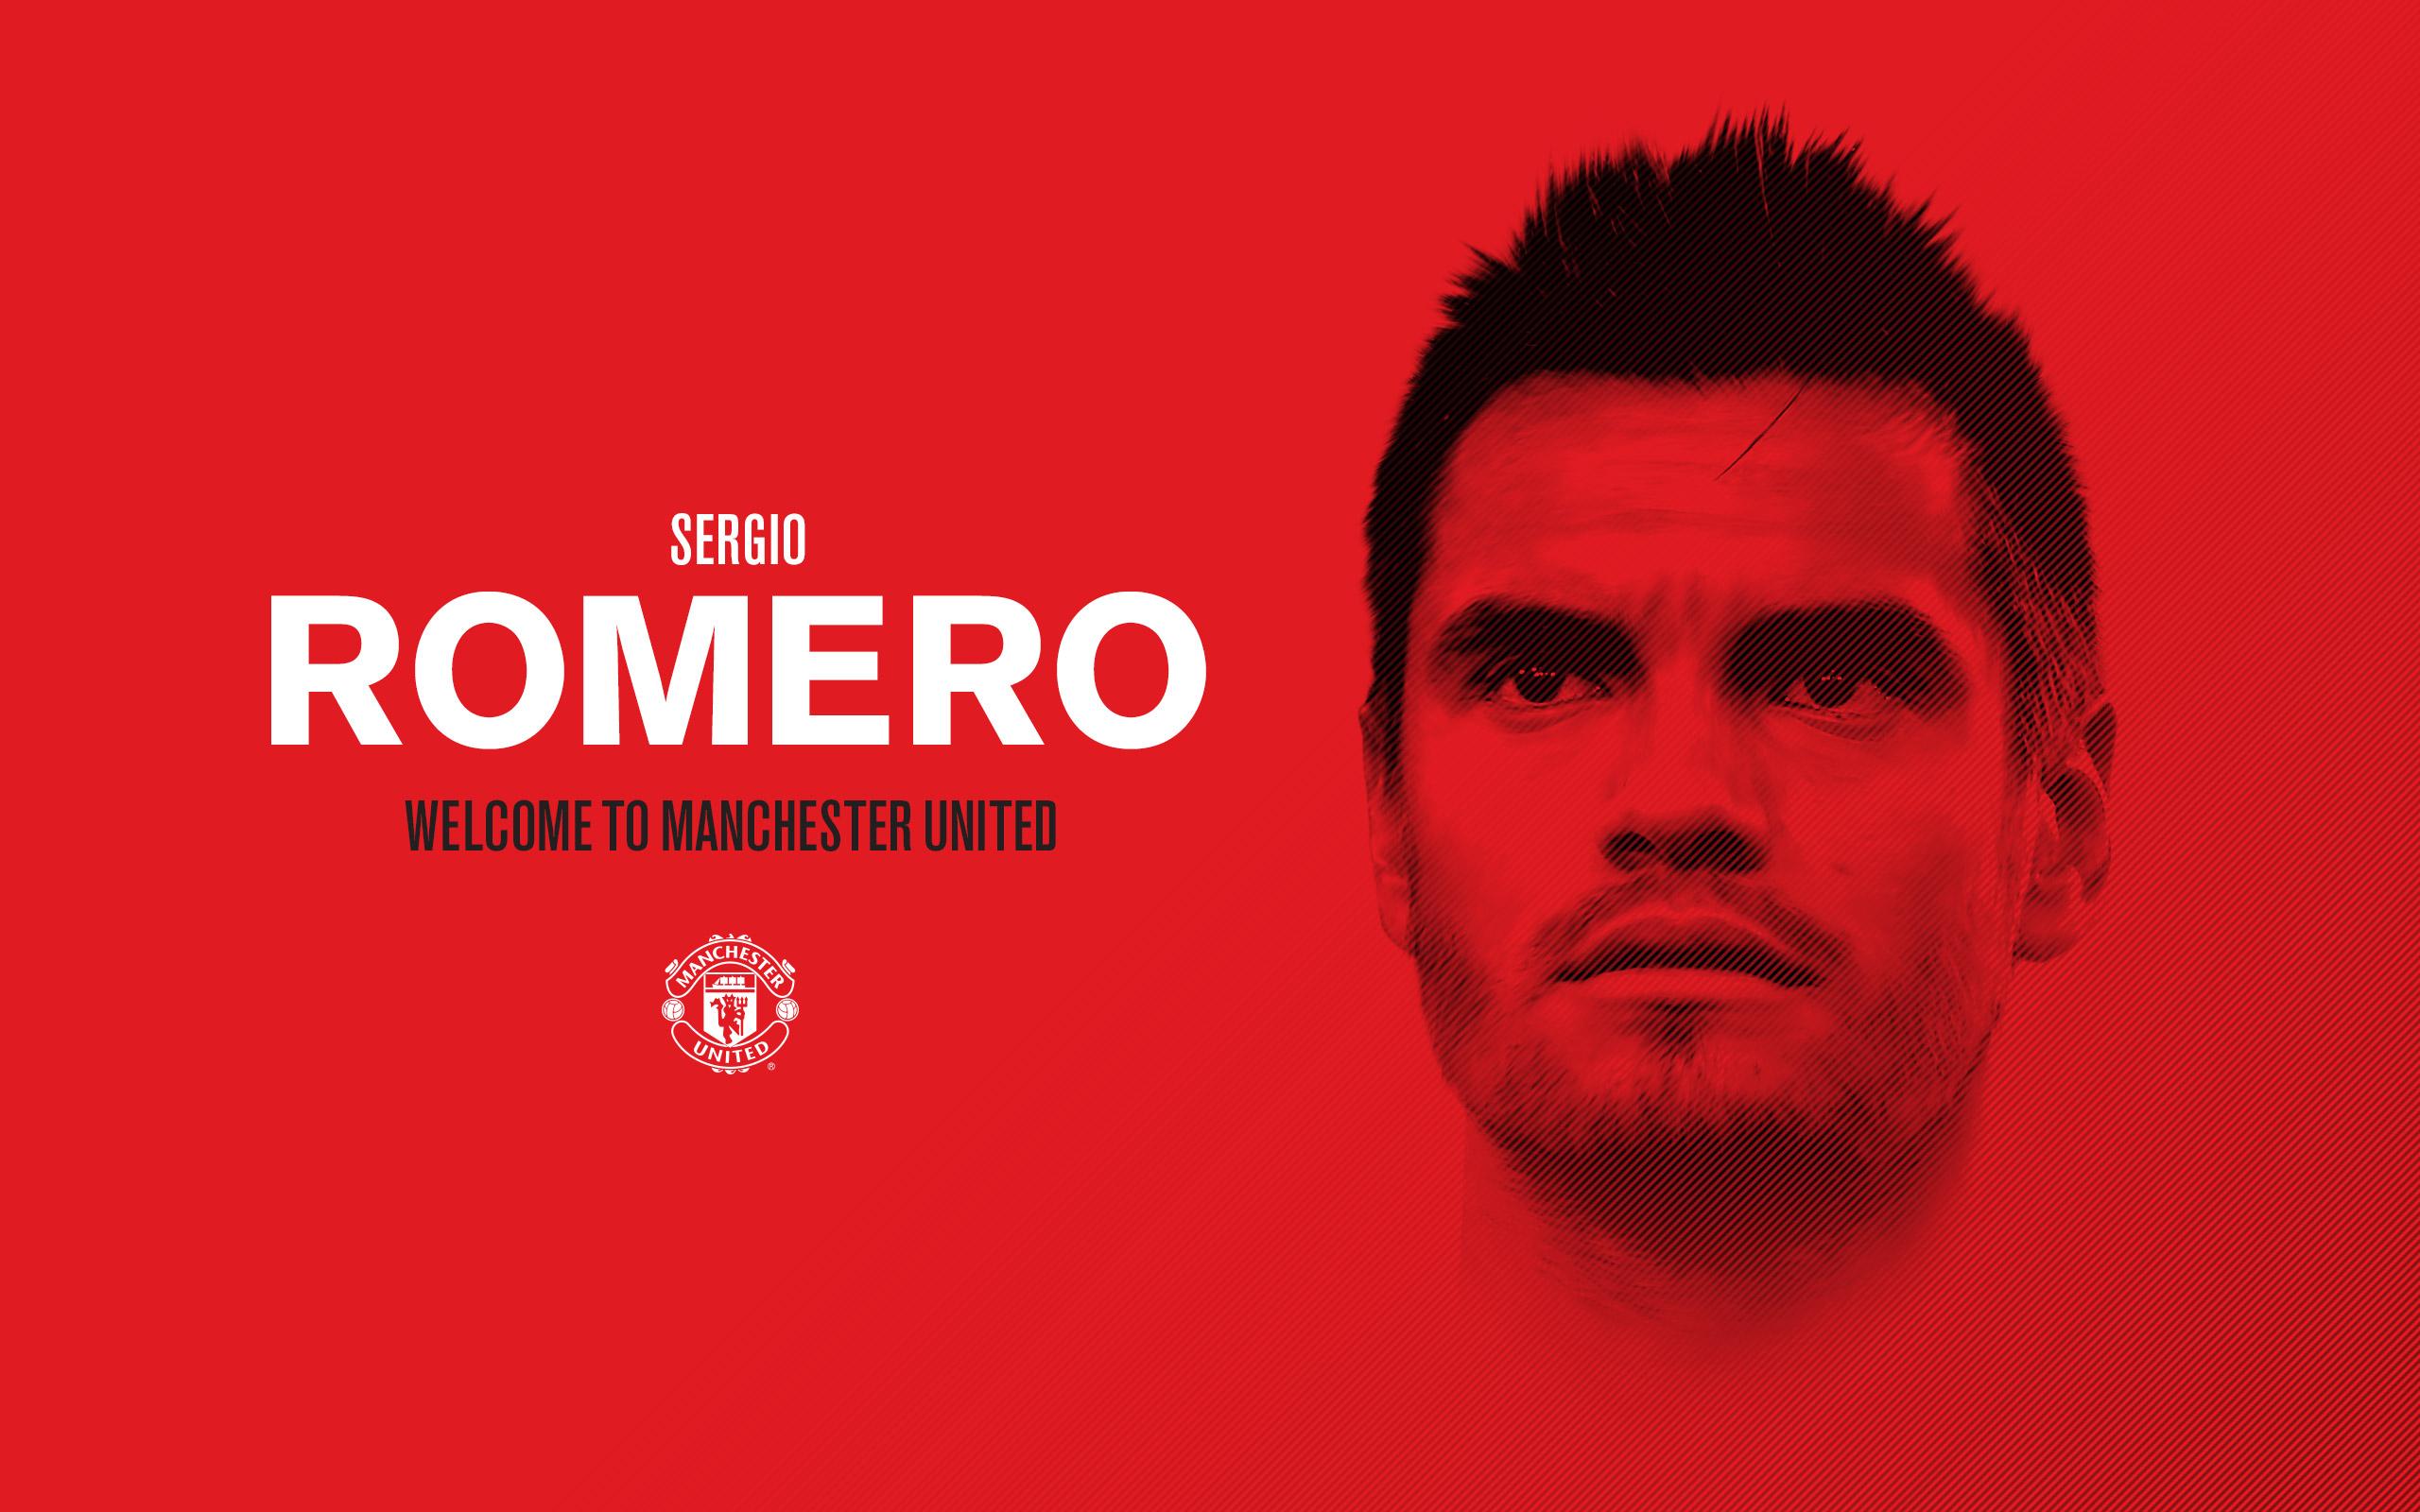 رسمياً … مانشستر يونايتد يمدد عقد حارسه روميرو حتى 2021